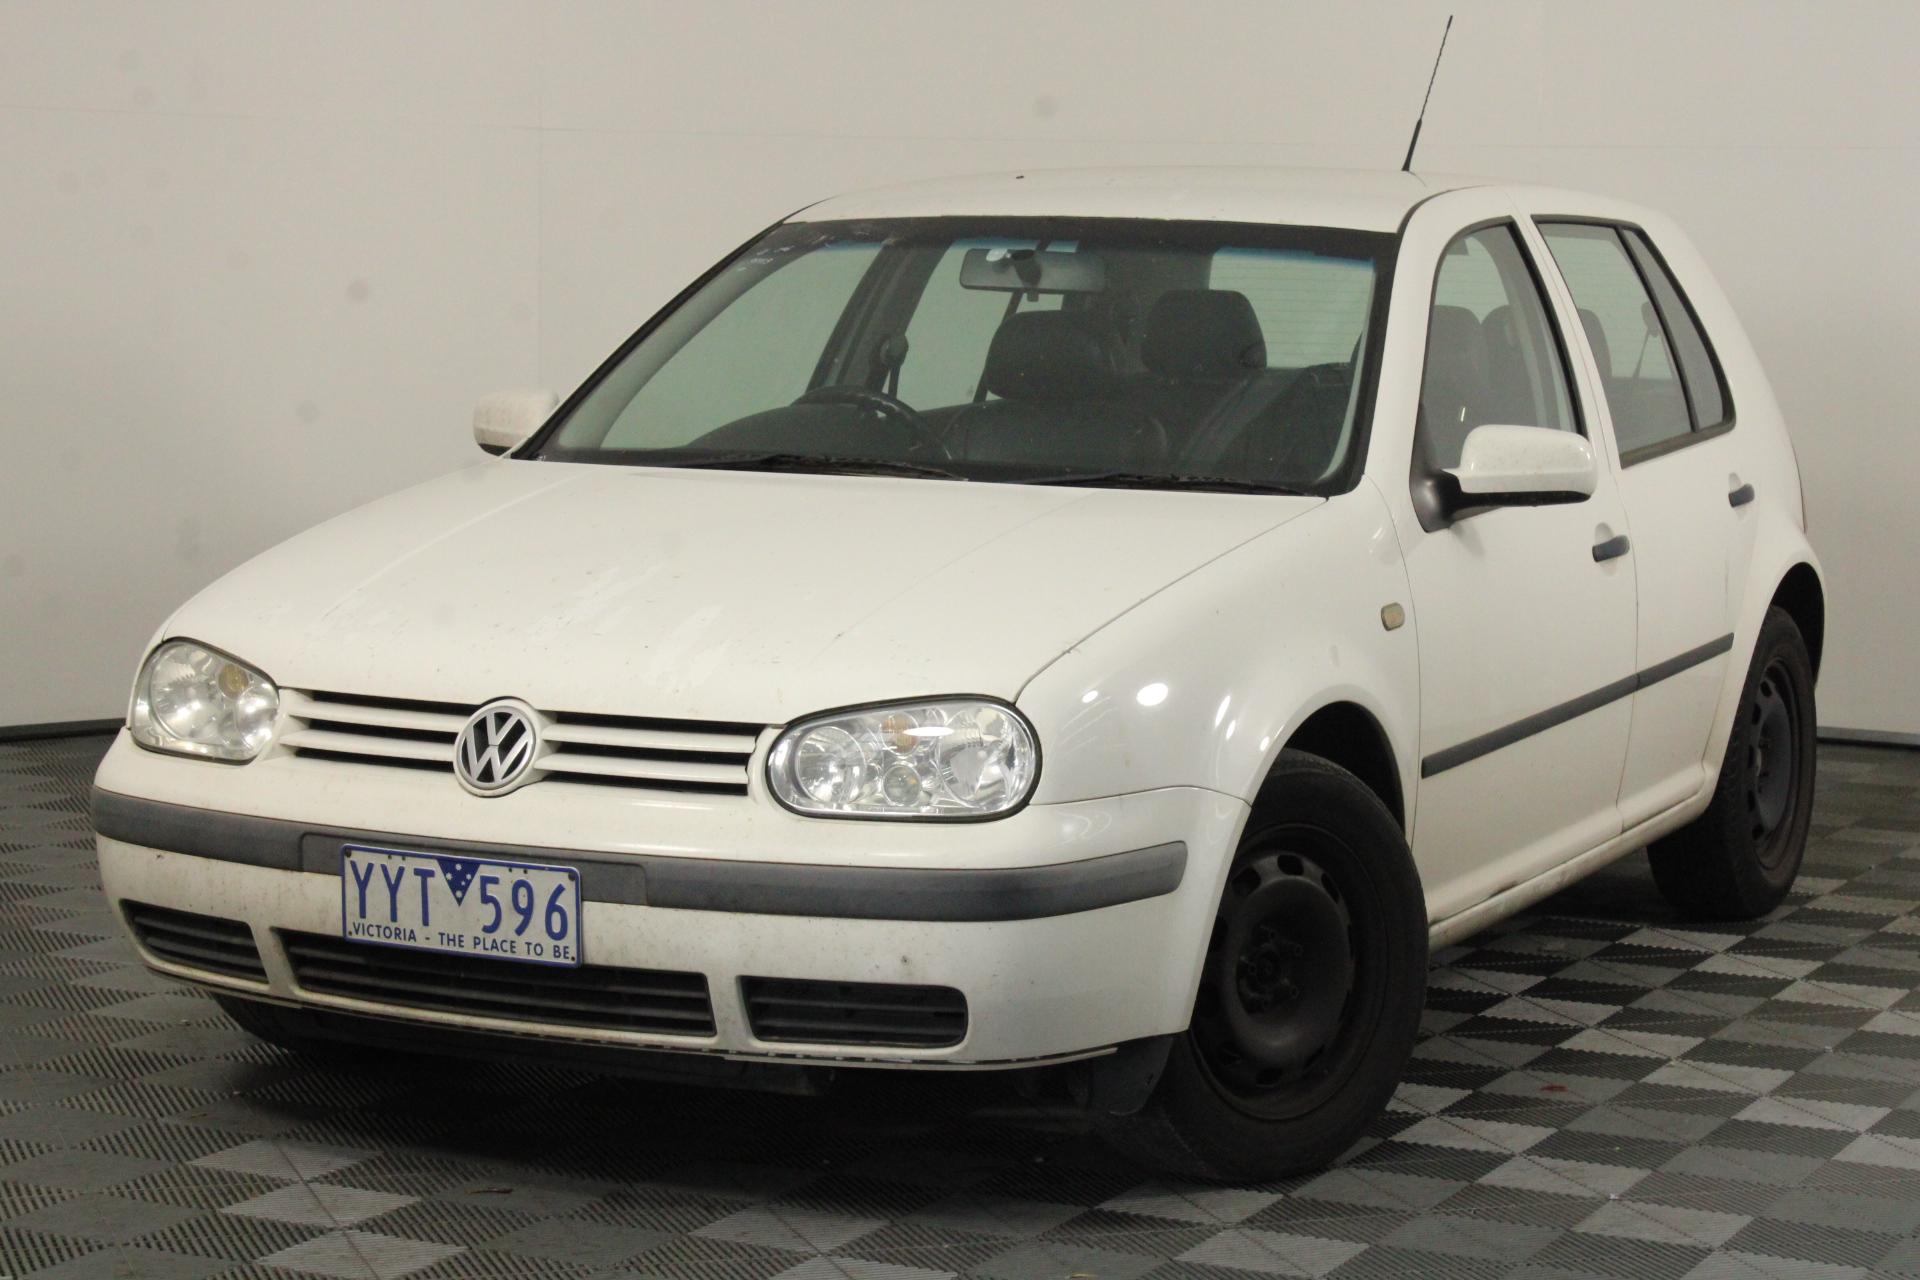 1998 Volkswagen Golf GL A4 Automatic Hatchback